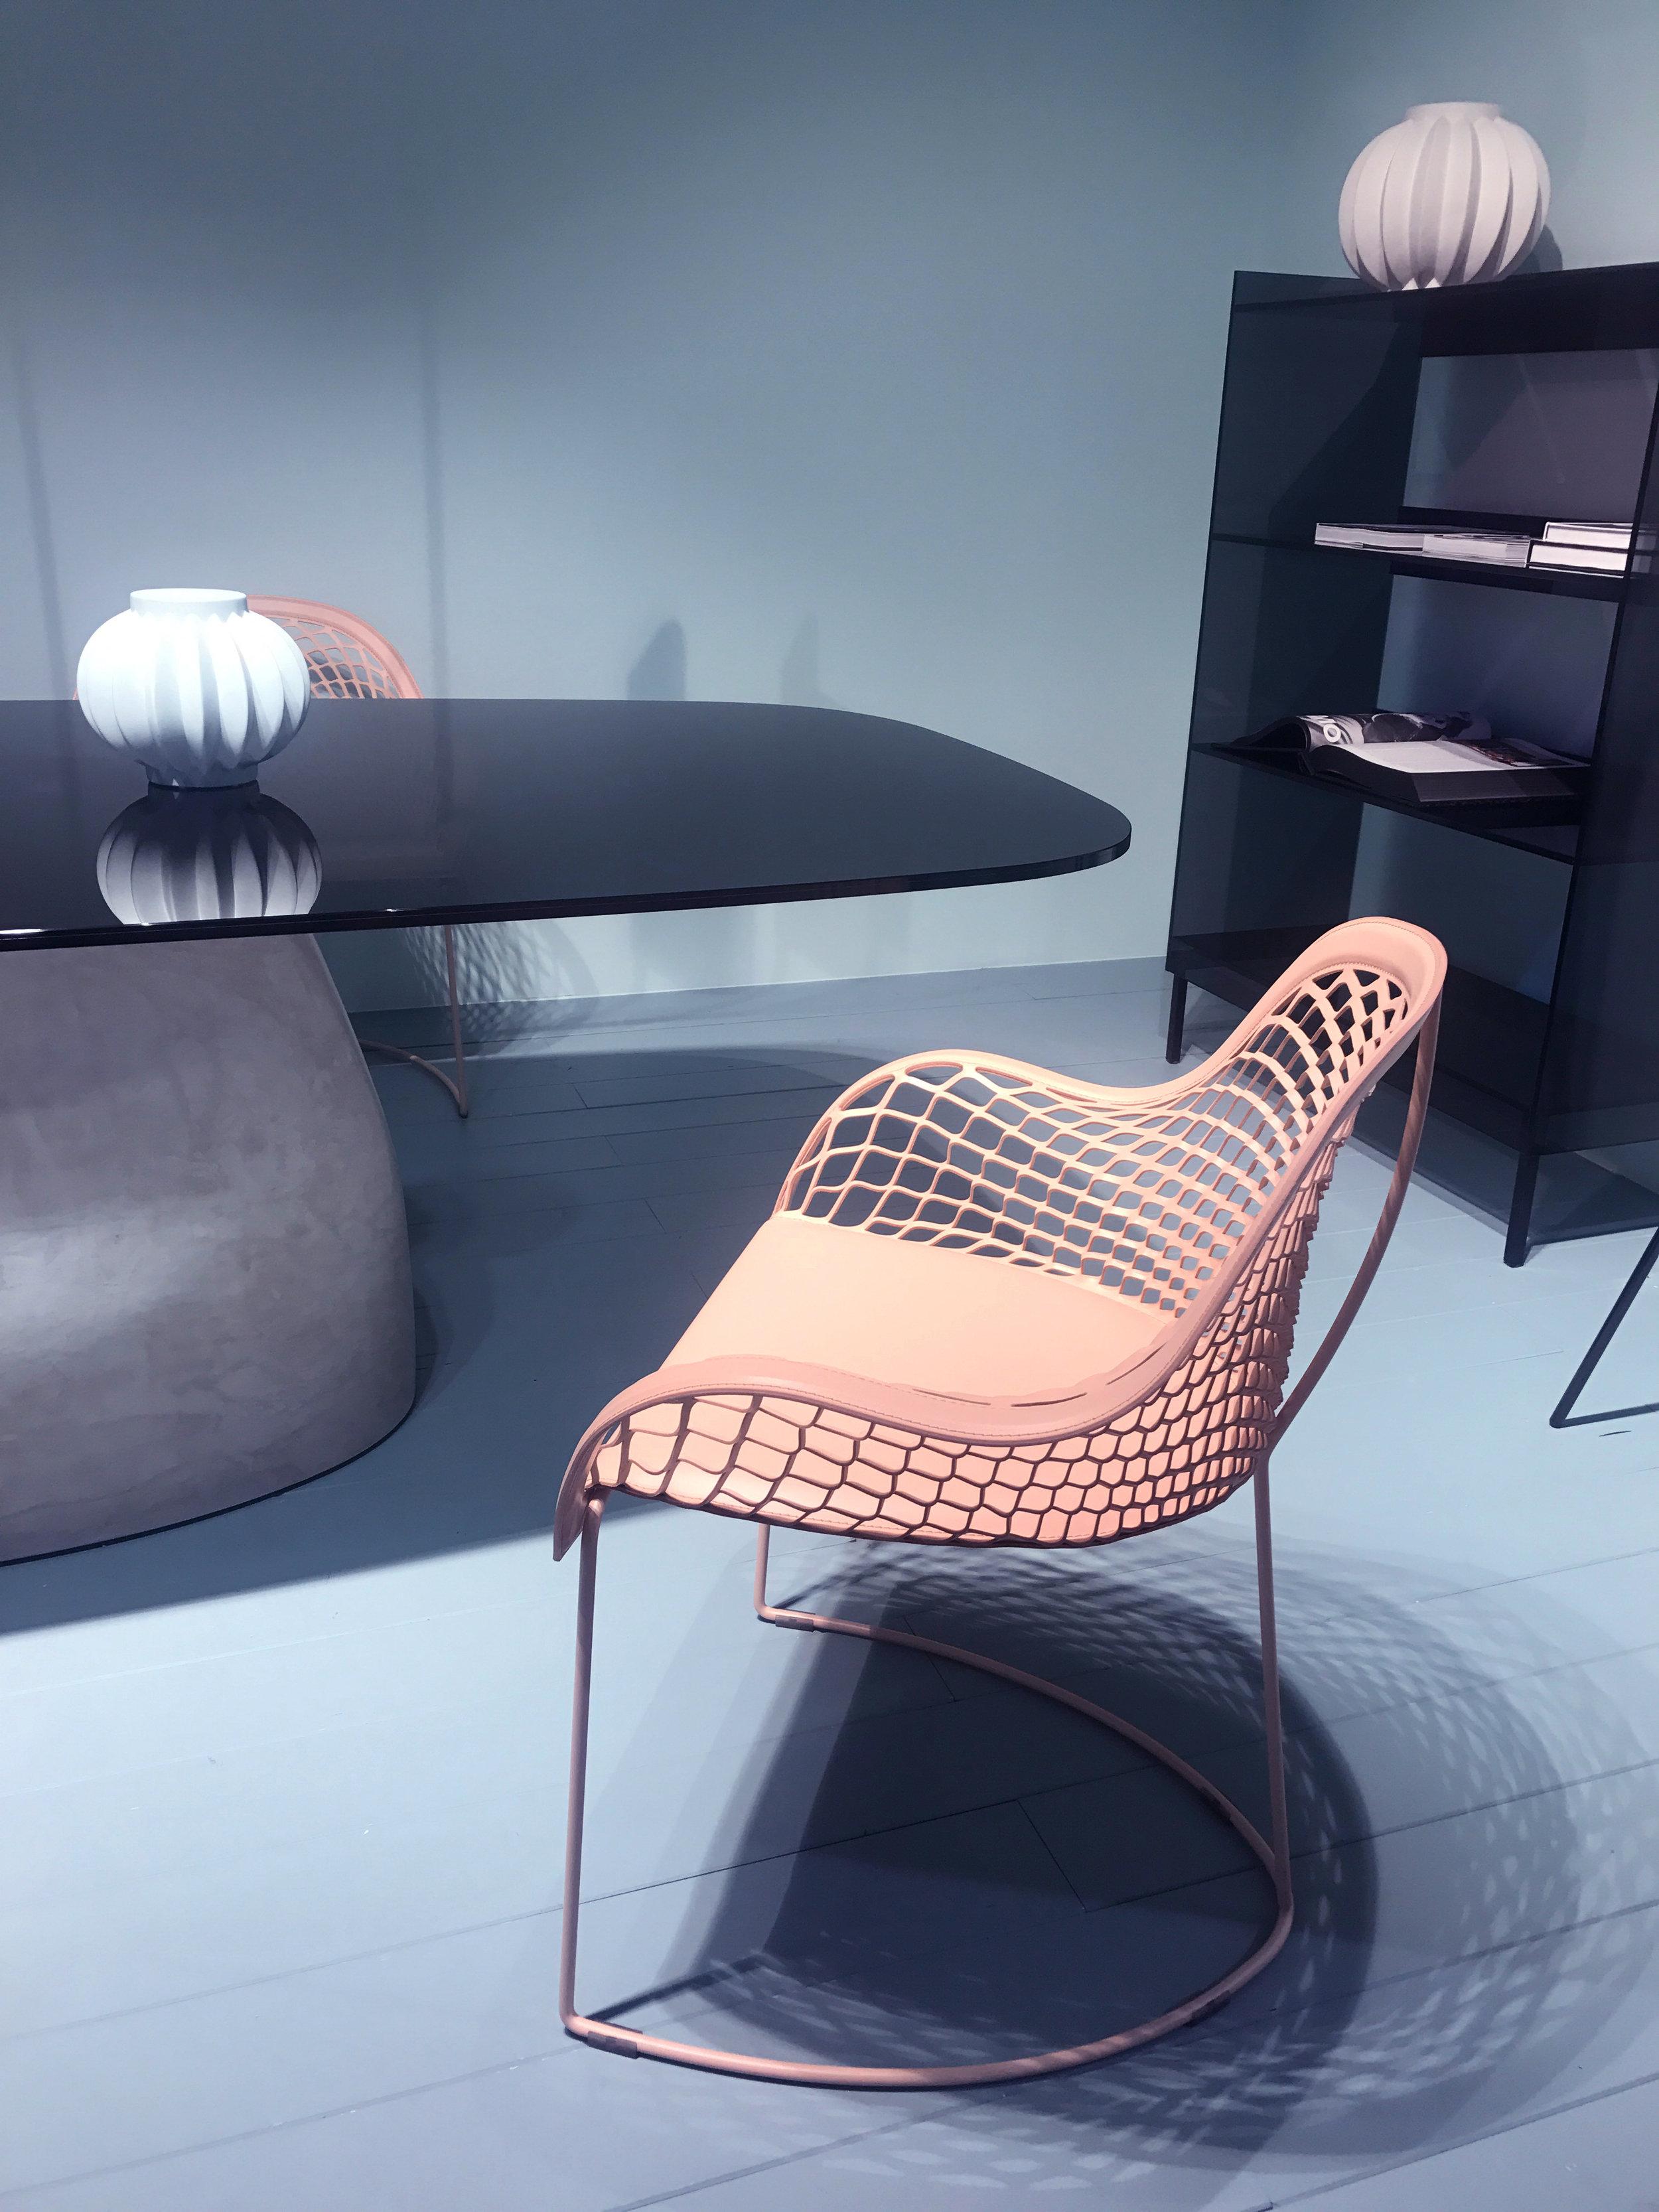 A_LONDON_Salone_del_Mobile_Milan_Design_Week_08.jpg